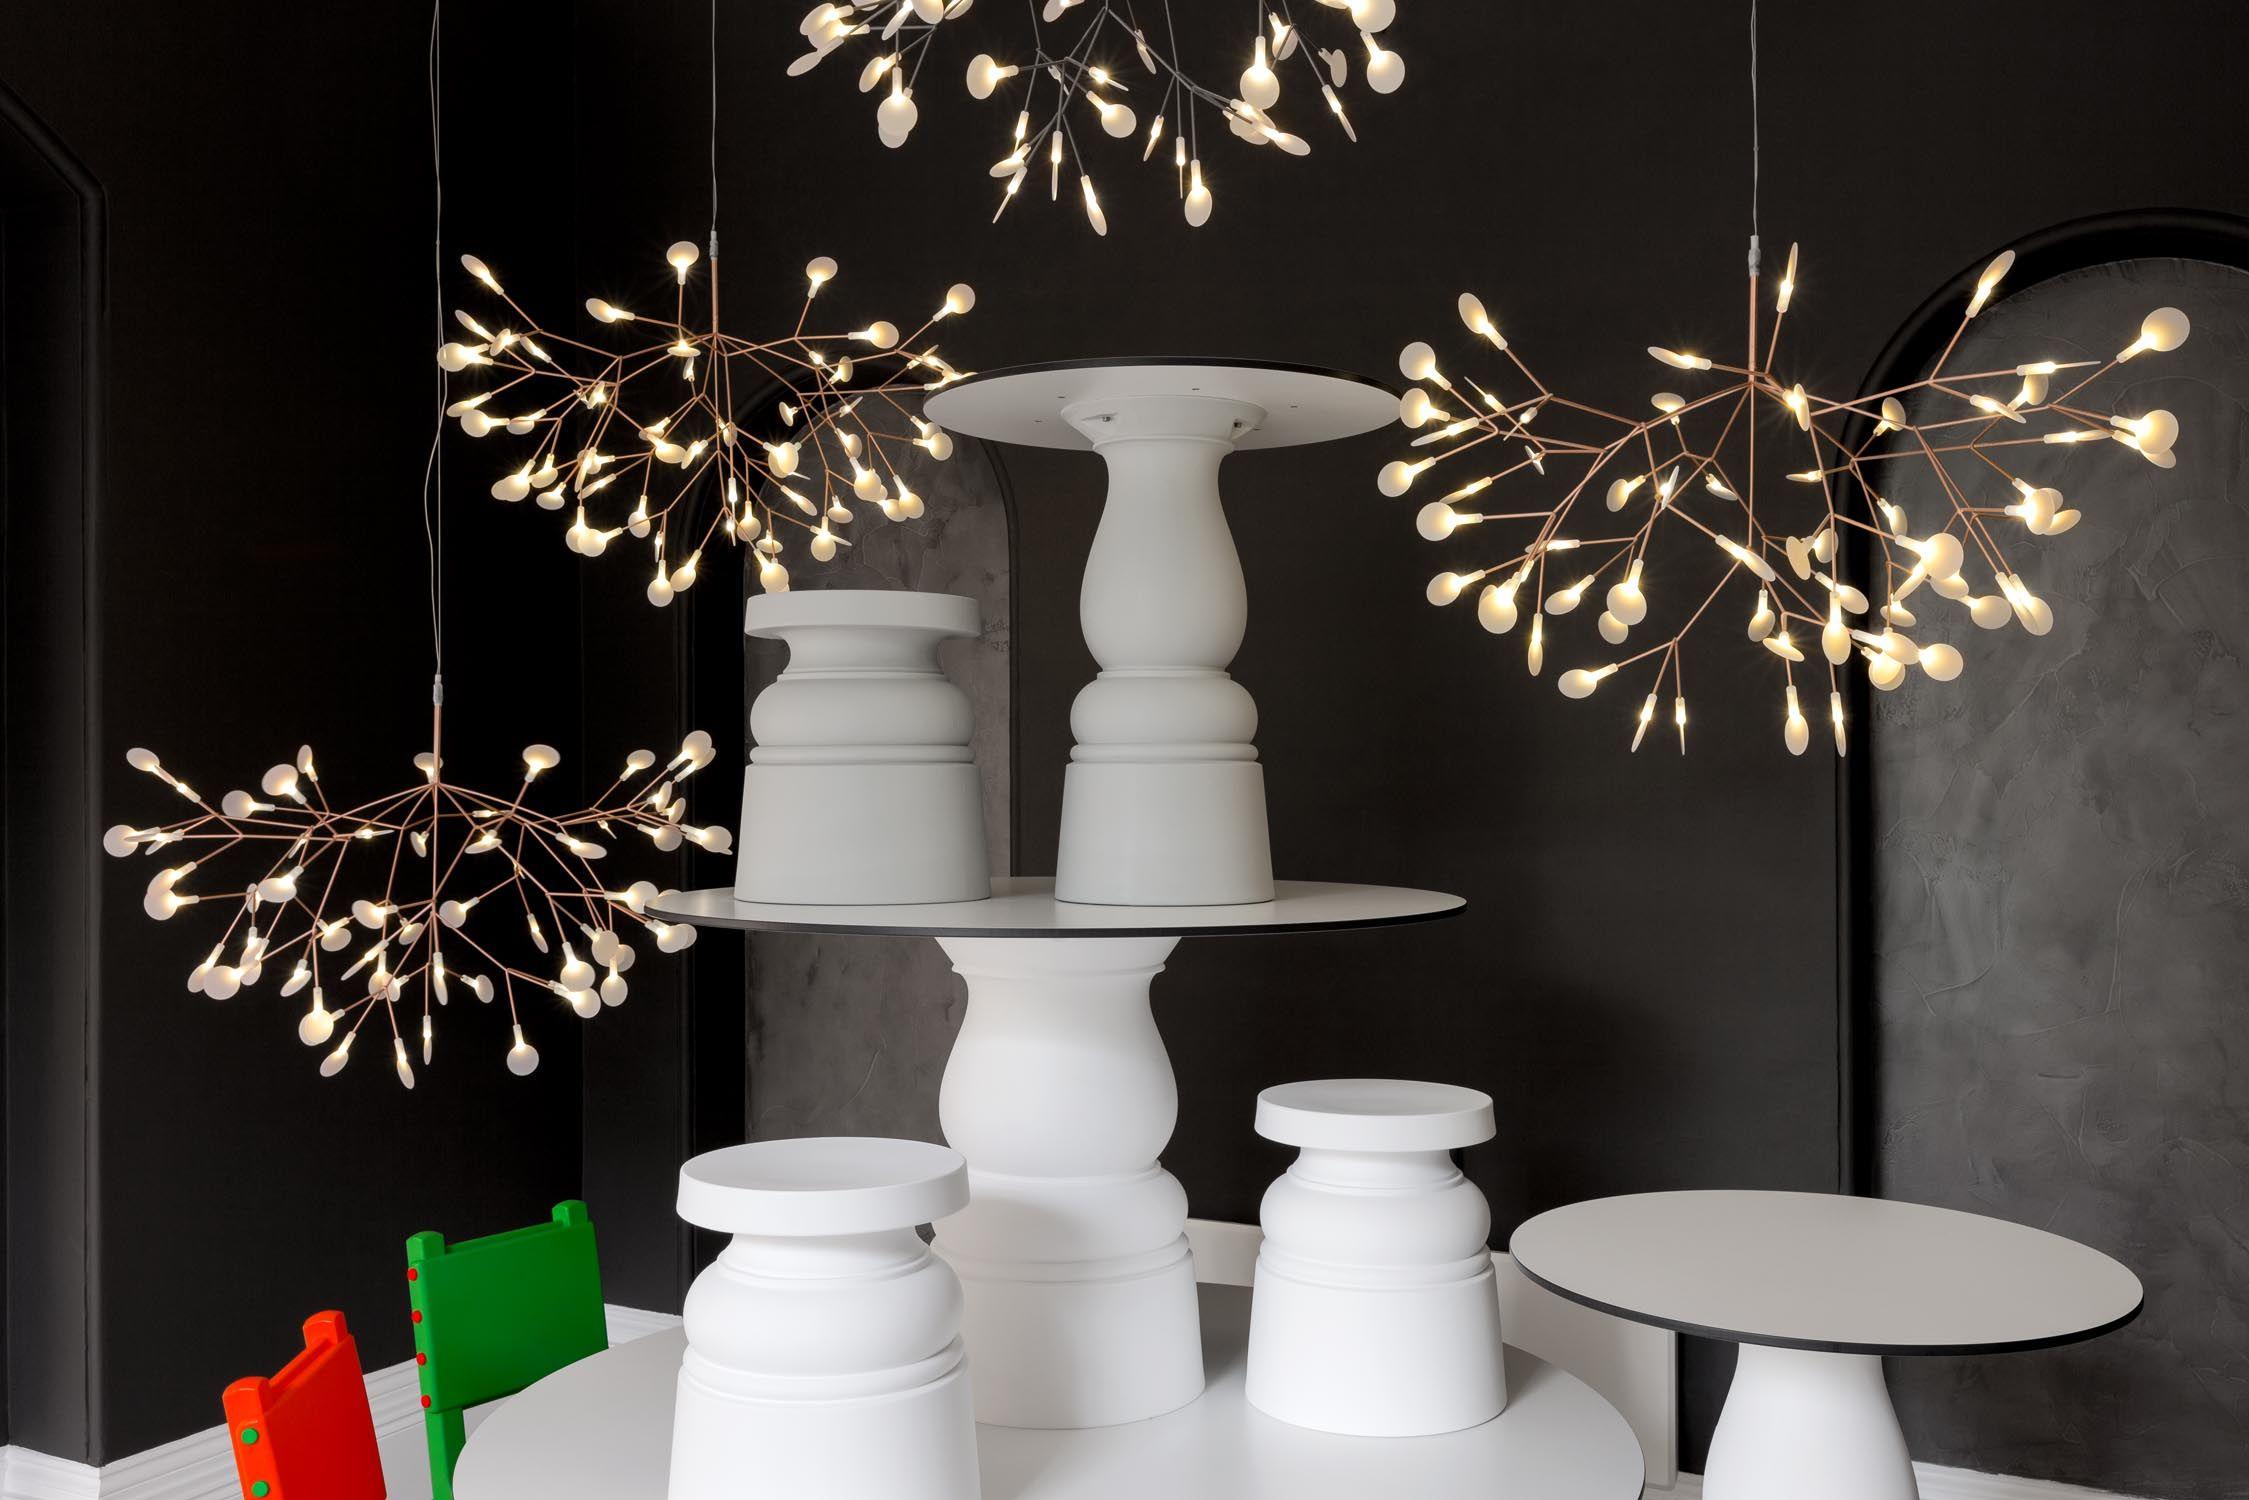 moooi heracleum ii suspension led light fixture in copper or nickel